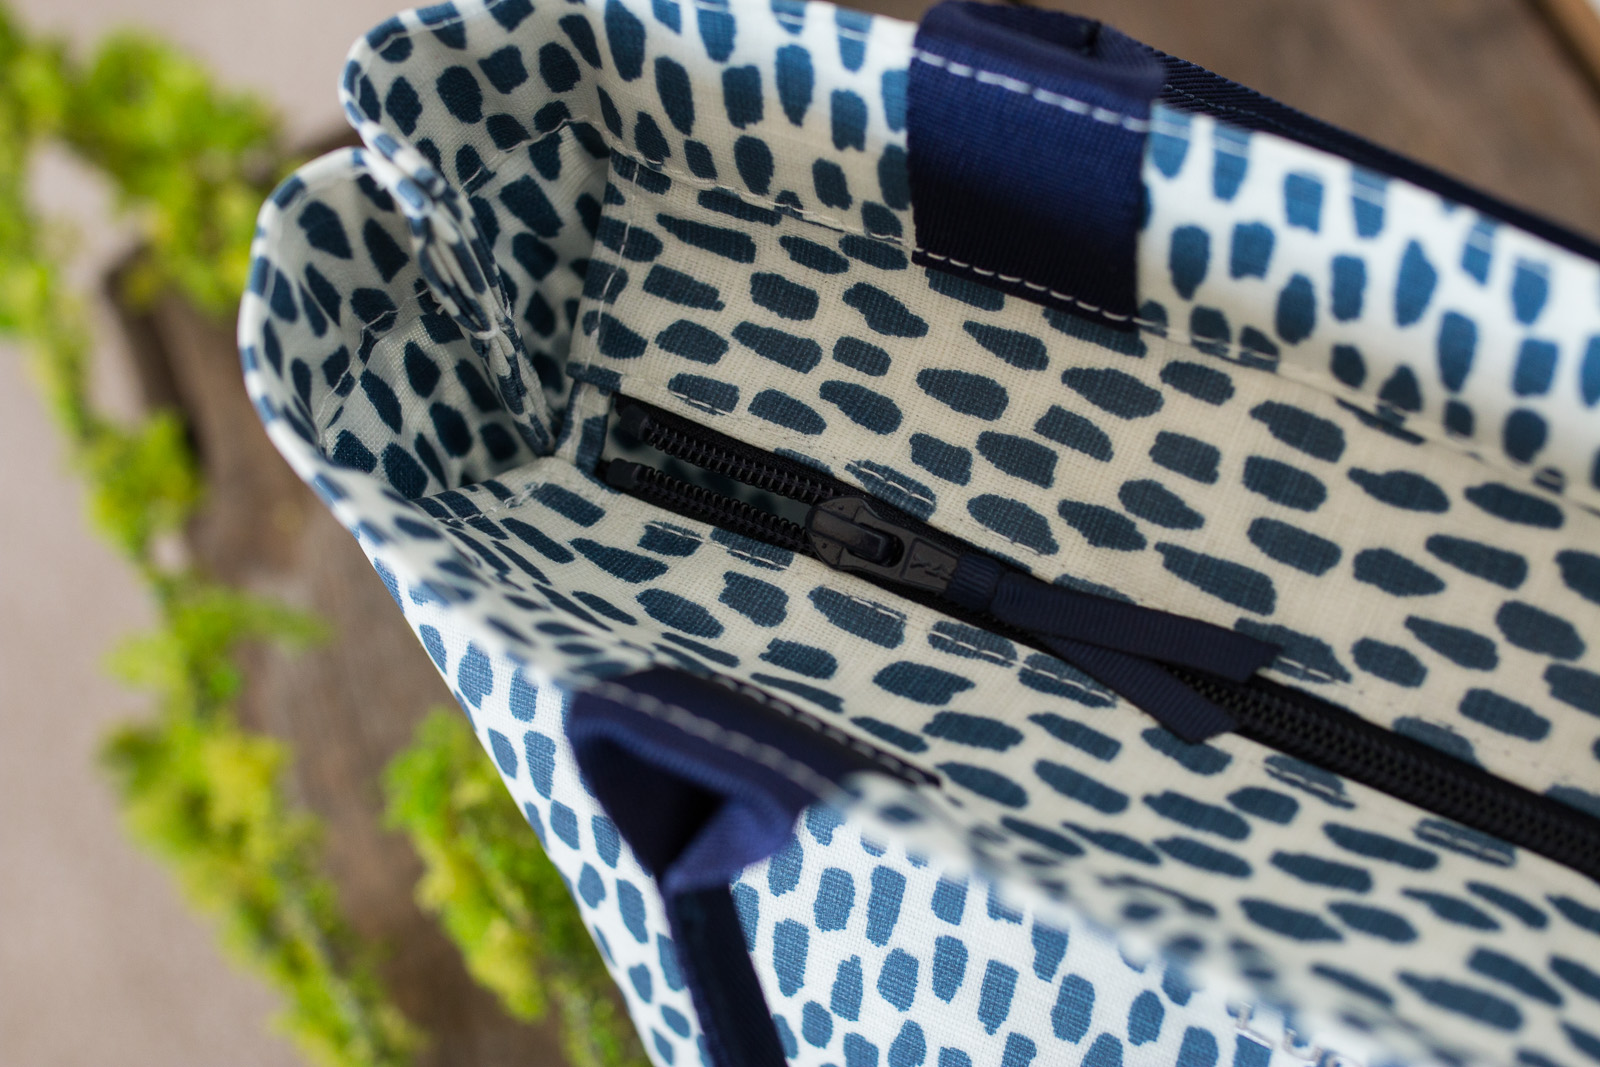 Navy Cobblestone Medium Zip Tote Bag with Navy Handles